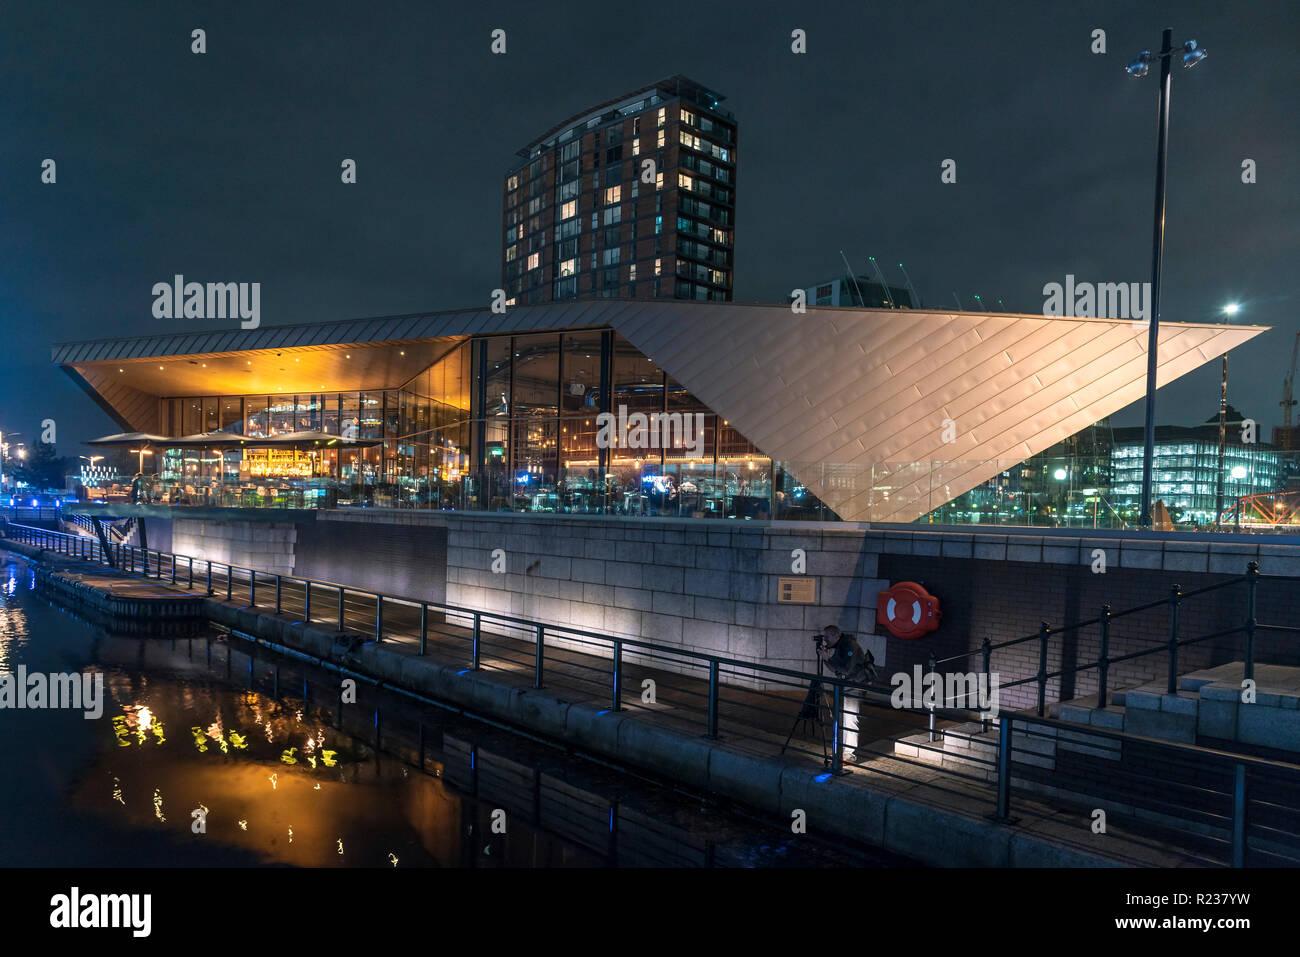 Salford Quays Media city at night. The Alchemist restaurant. - Stock Image